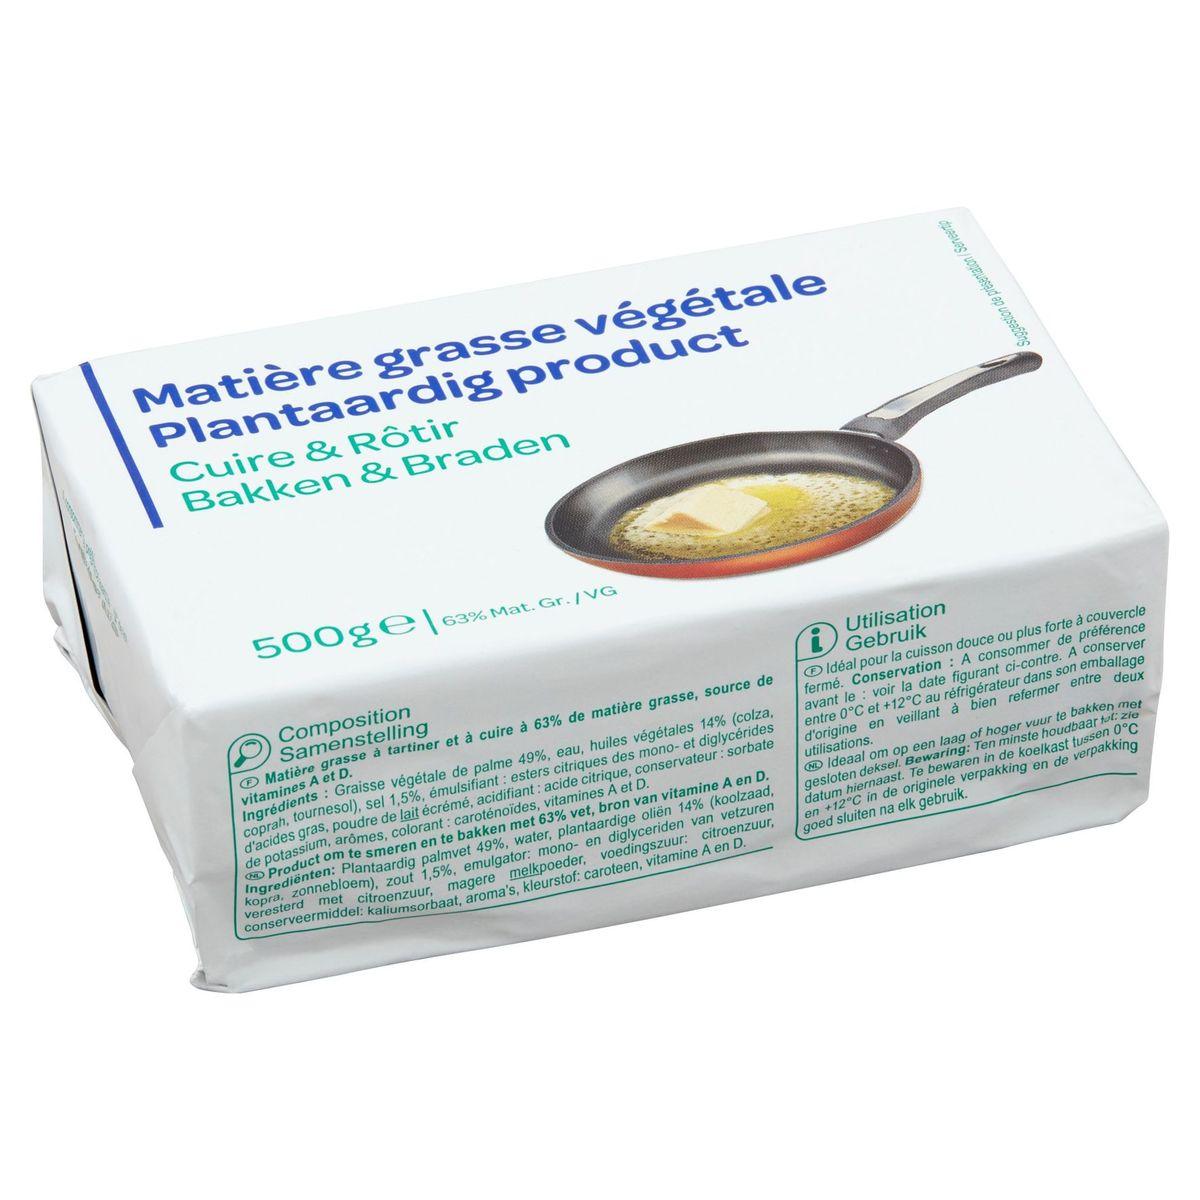 Matière Grasse Végétale Cuire & Rôtir 500 g